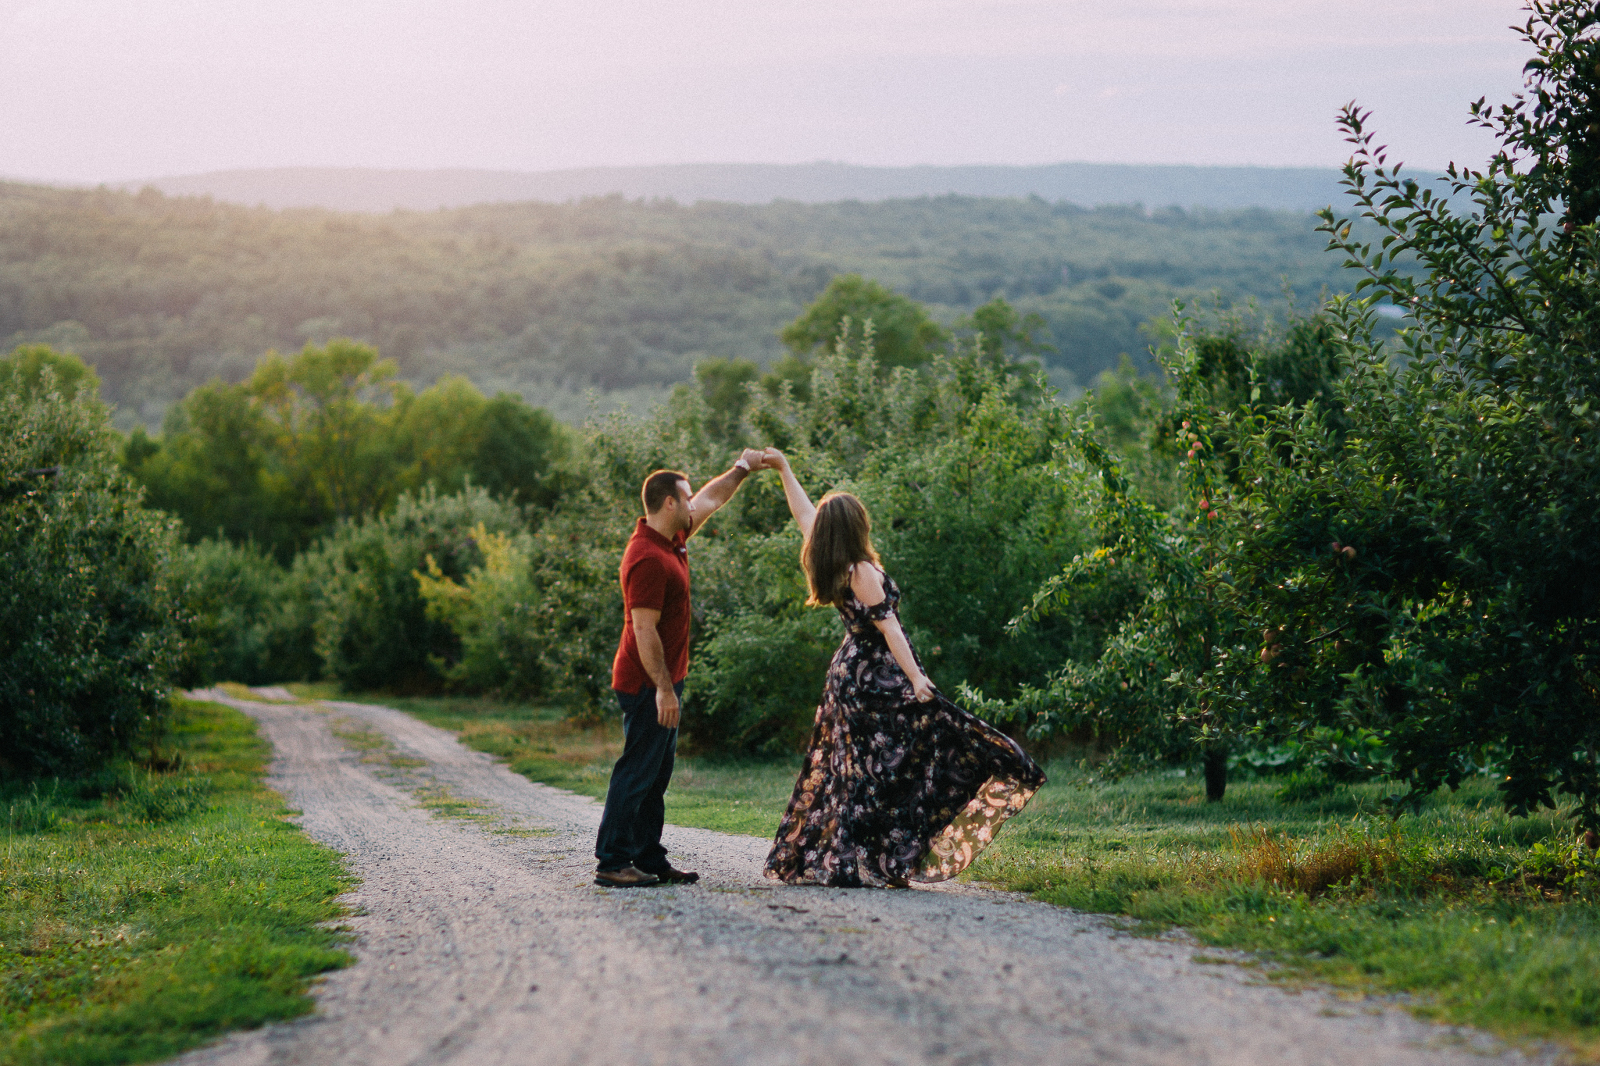 maine wedding photographer, freeport maine photographer, alfred maine wedding photographer, engagement photos in Maine -2-7